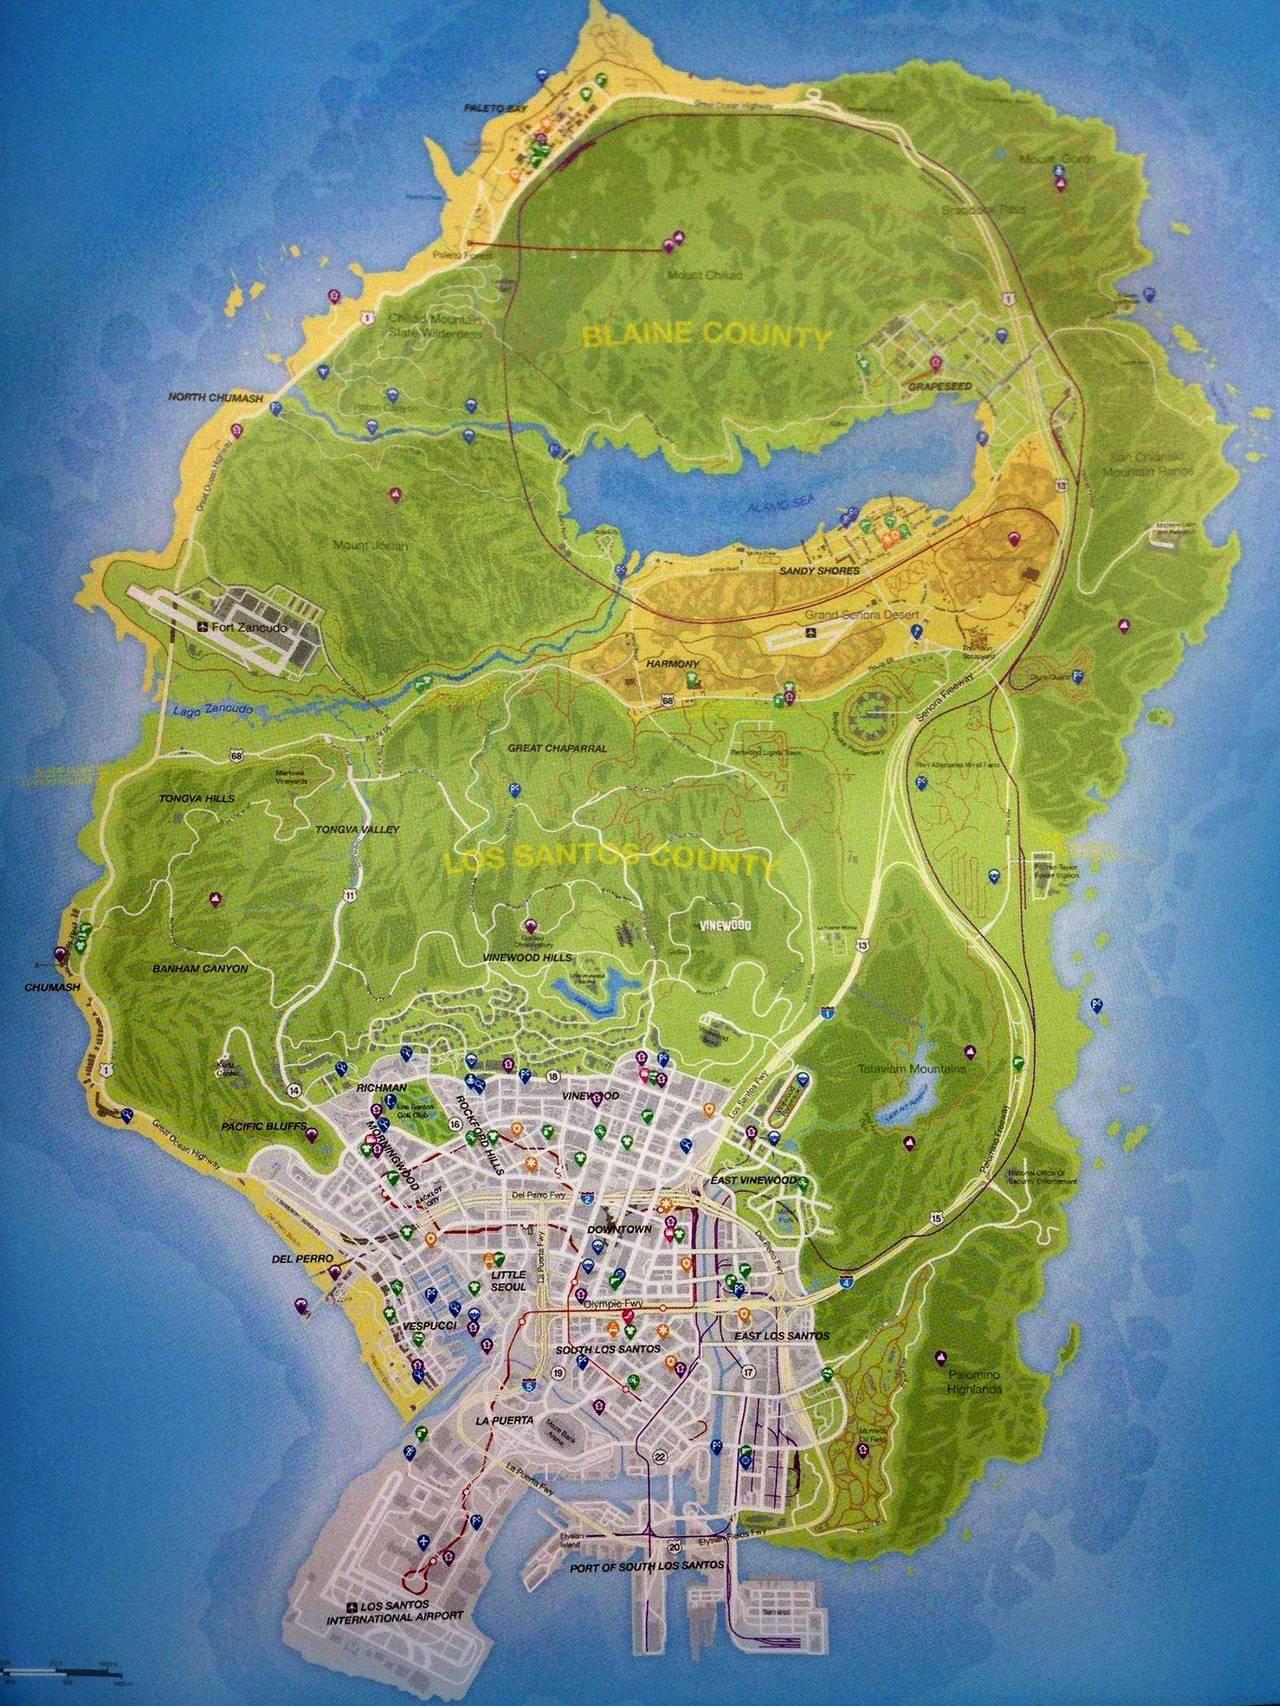 http://image.jeuxvideo.com/imd/m/mapgta5.jpg